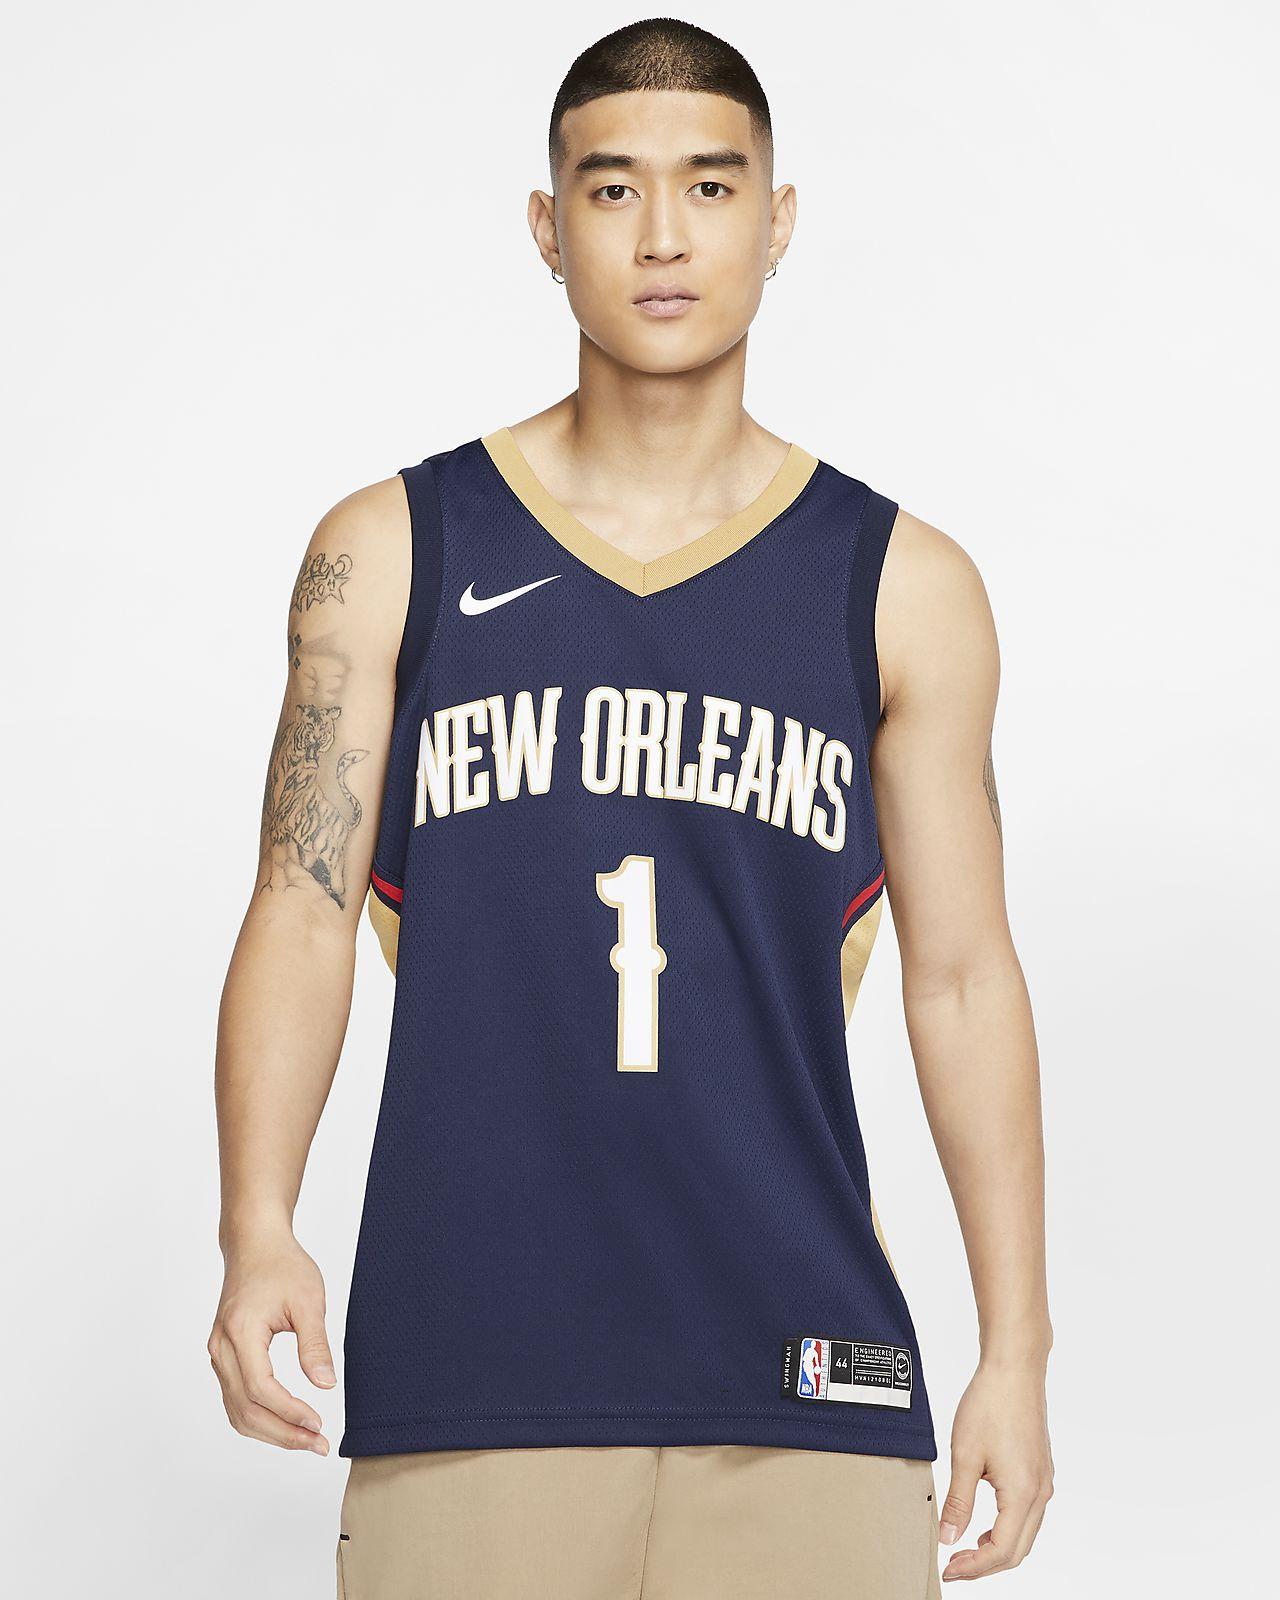 Zion Williamson Zion Williamson (NBA) Icon Edition Swingman (New Orleans Pelicans) Men's Nike NBA Connected Jersey